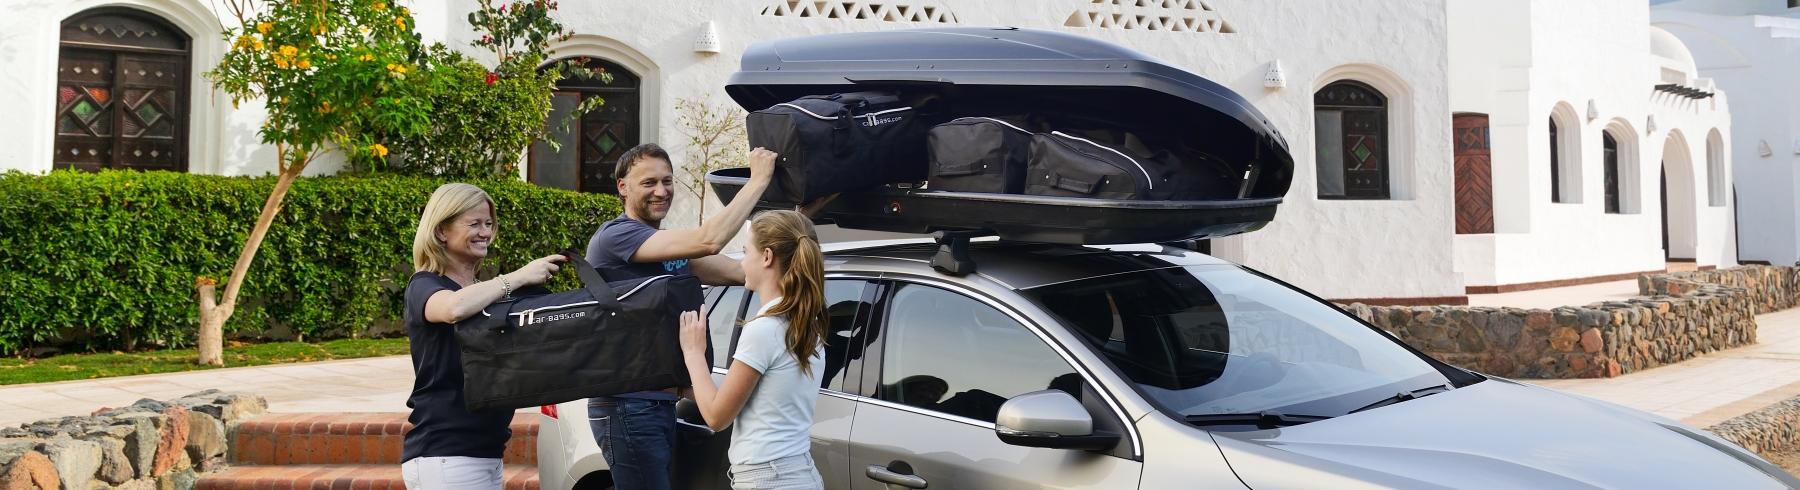 car-bags-dakboxtassen-inladen-zomer